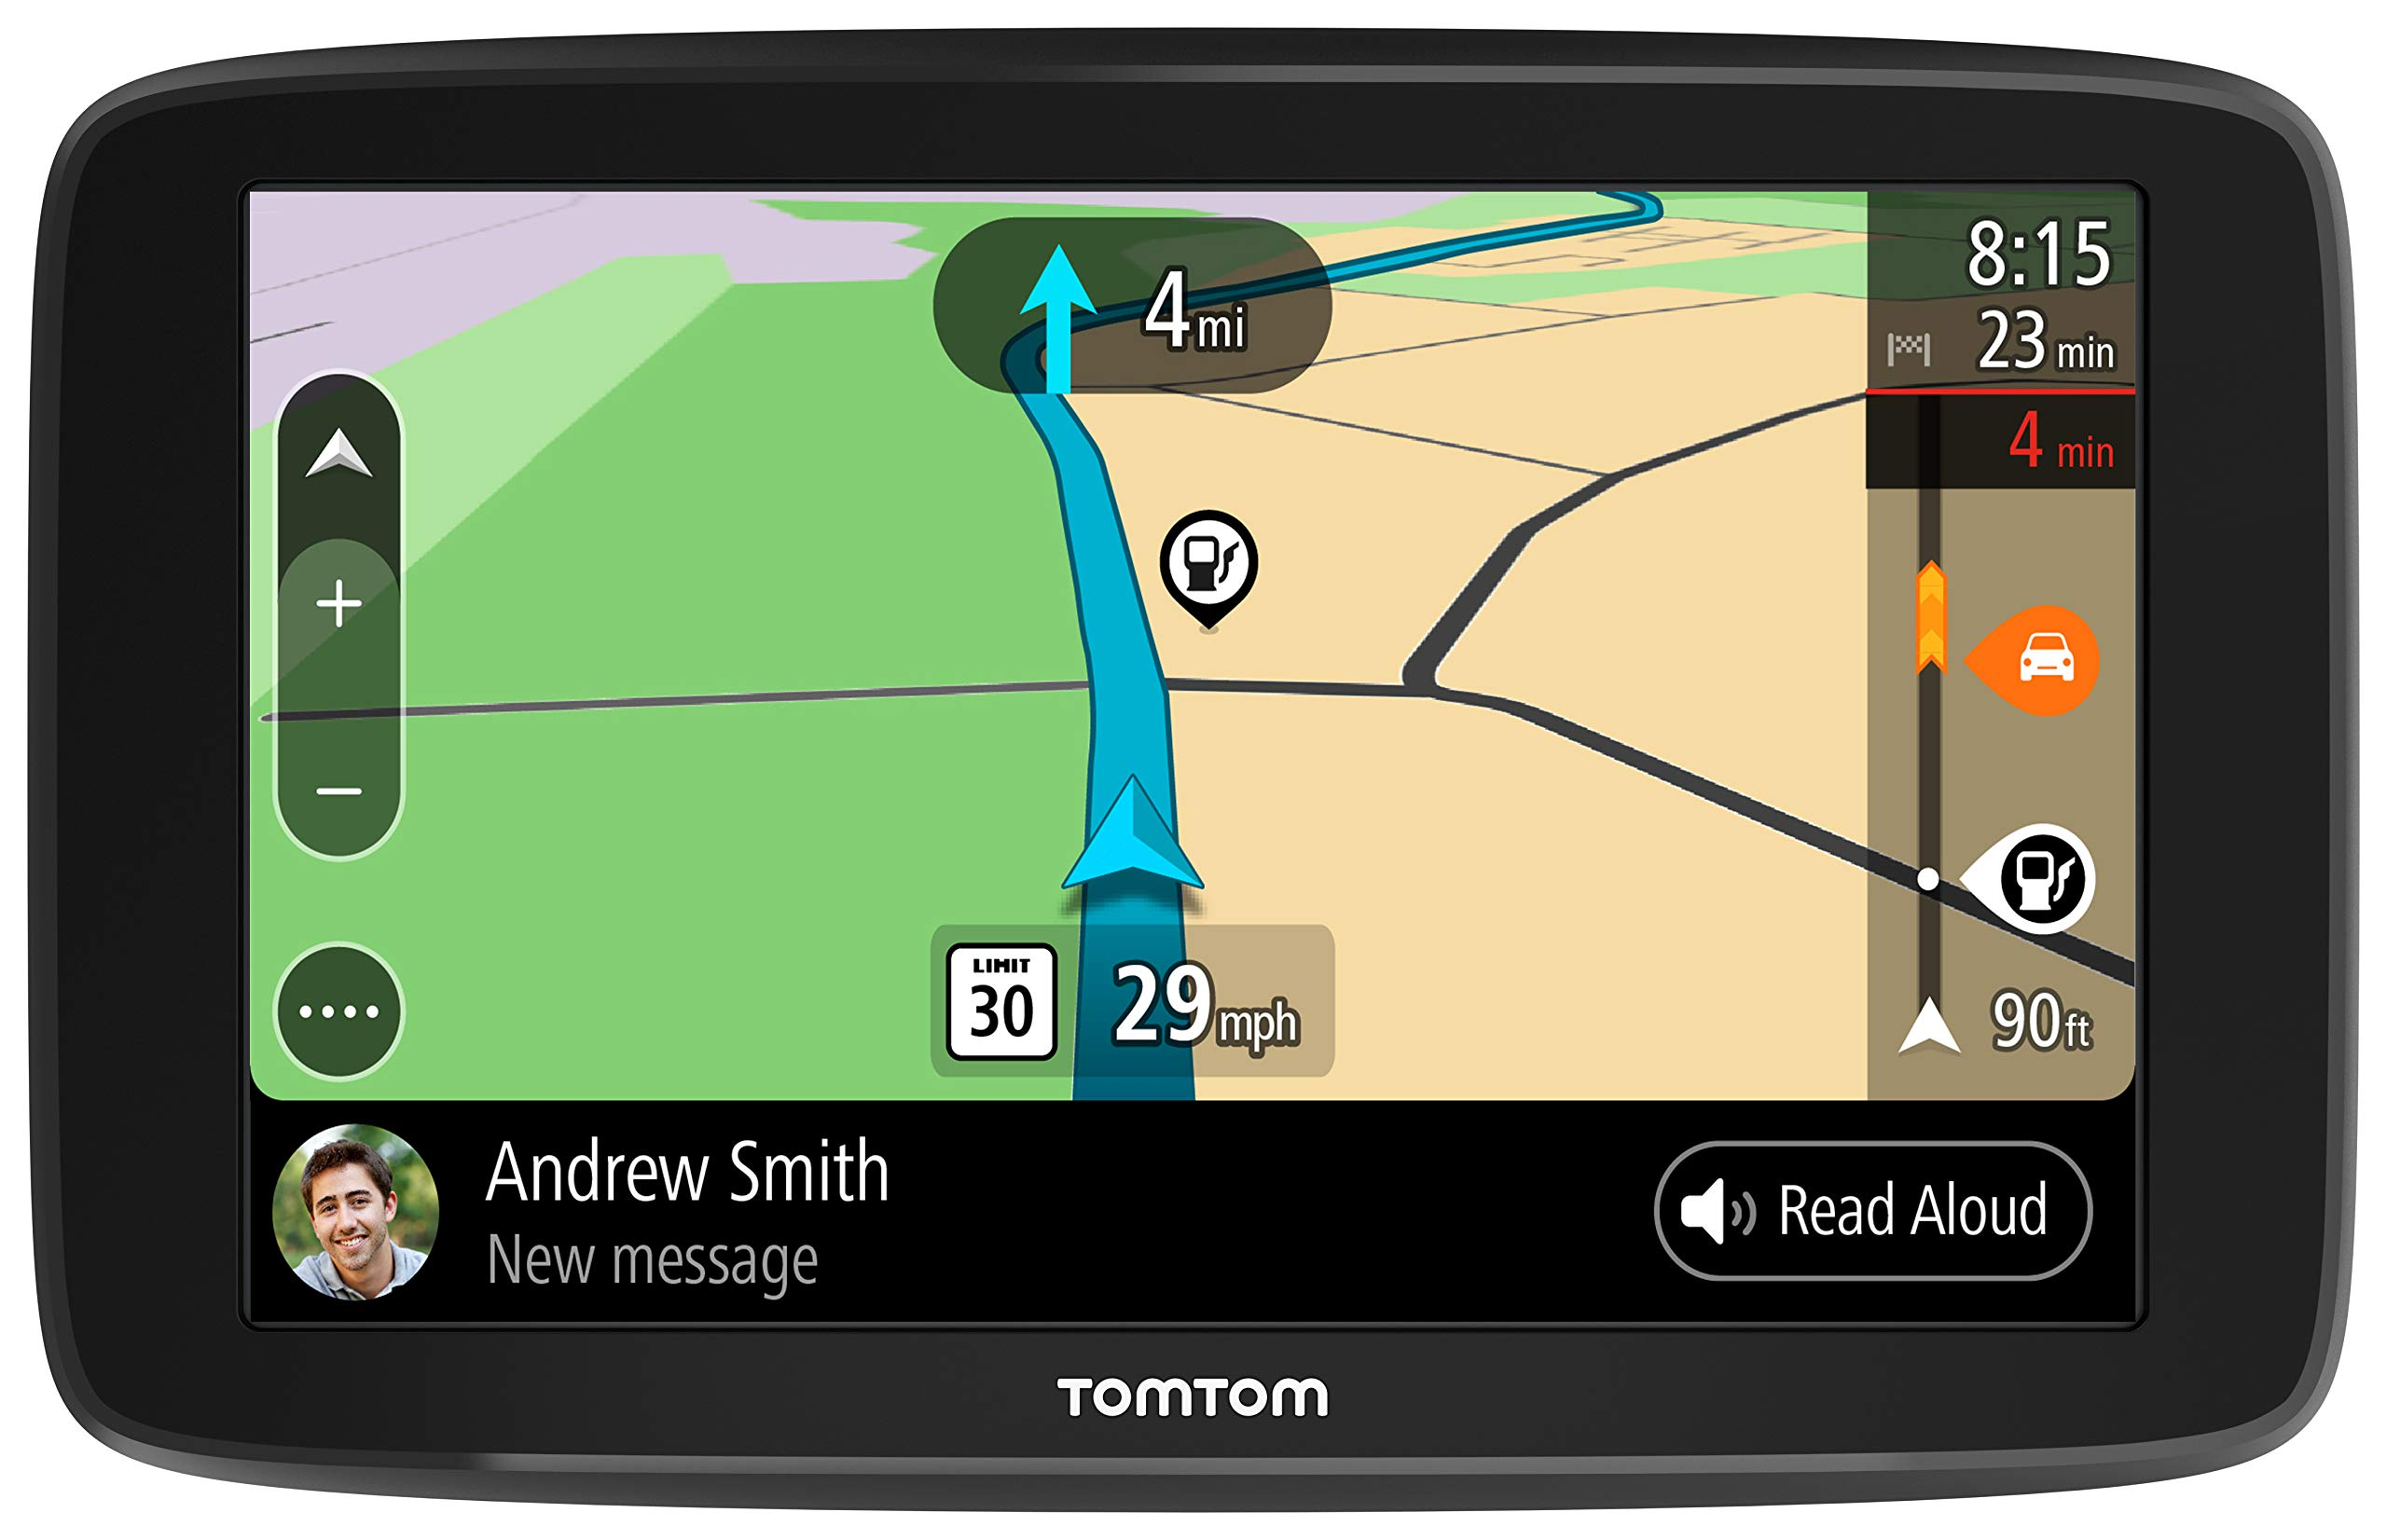 Navigation TomTom Lifetime Destination Prediction